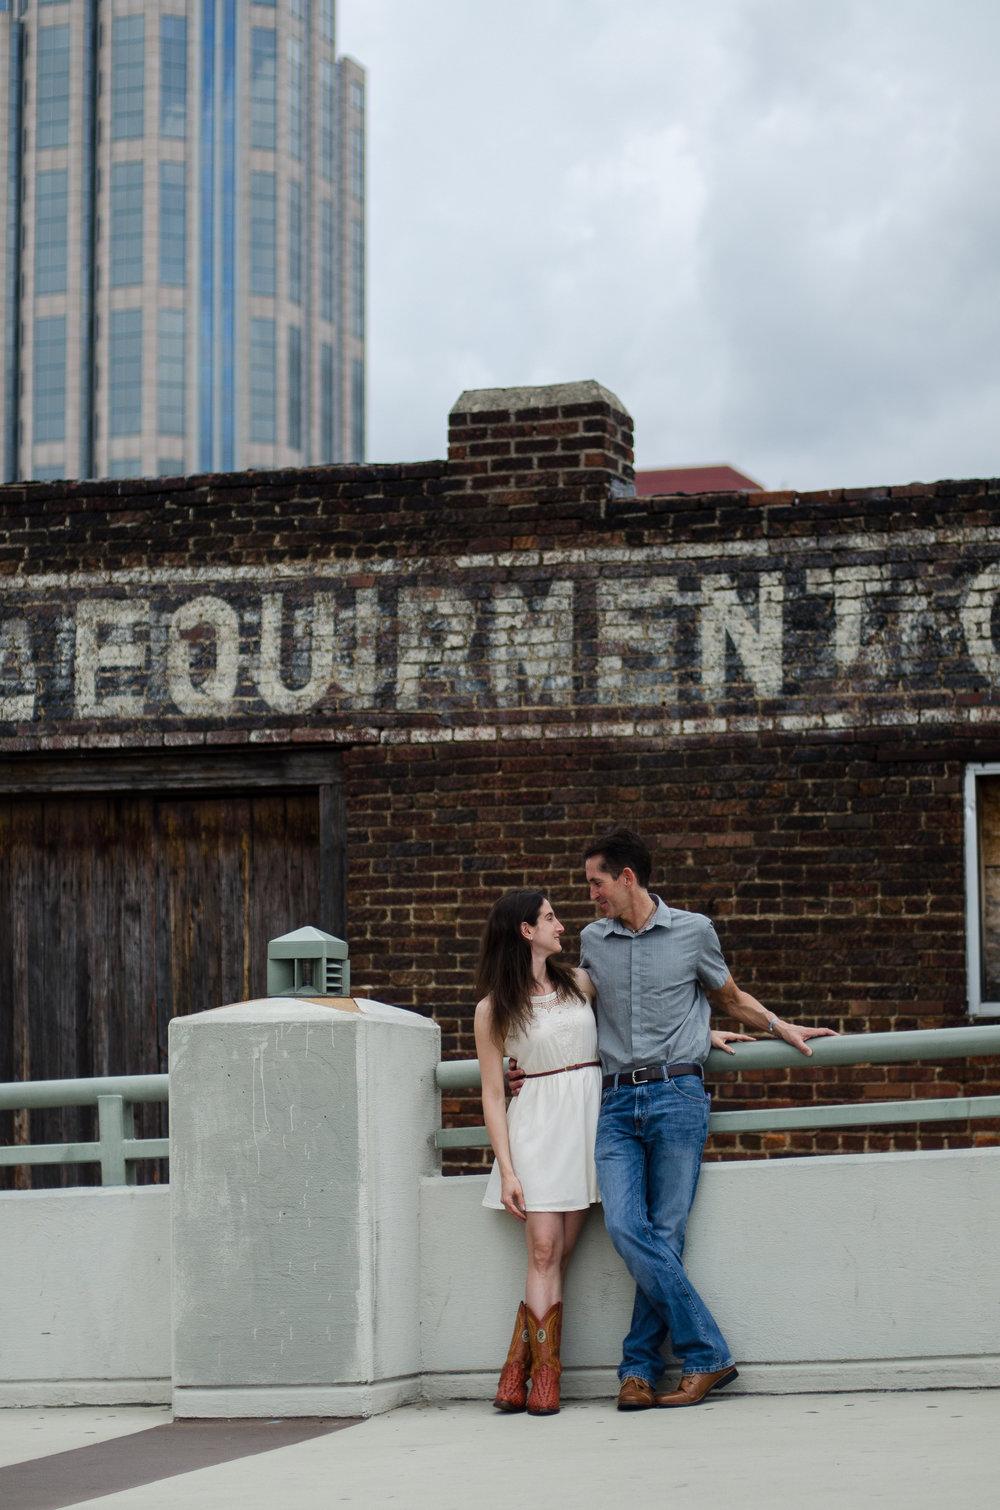 Nashville Tennessee Anniversary Sean and Karen from Chicago